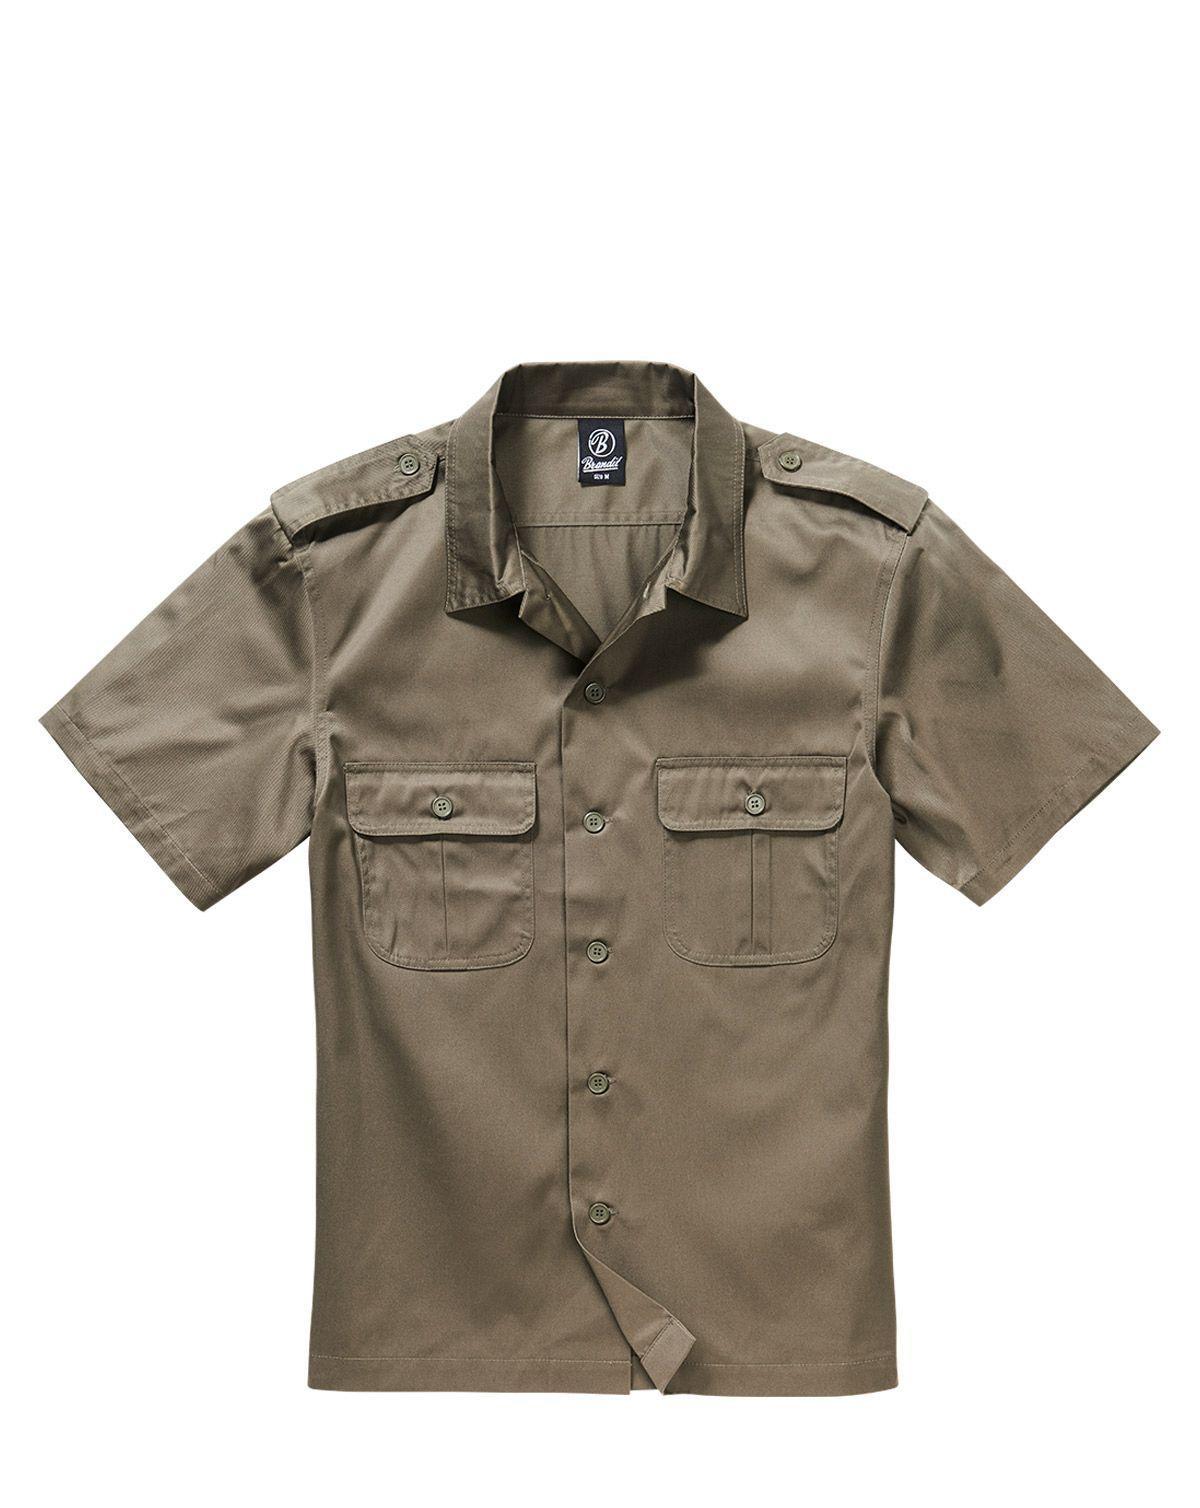 Image of   Brandit U.S. Army Skjorte (Oliven, 5XL)